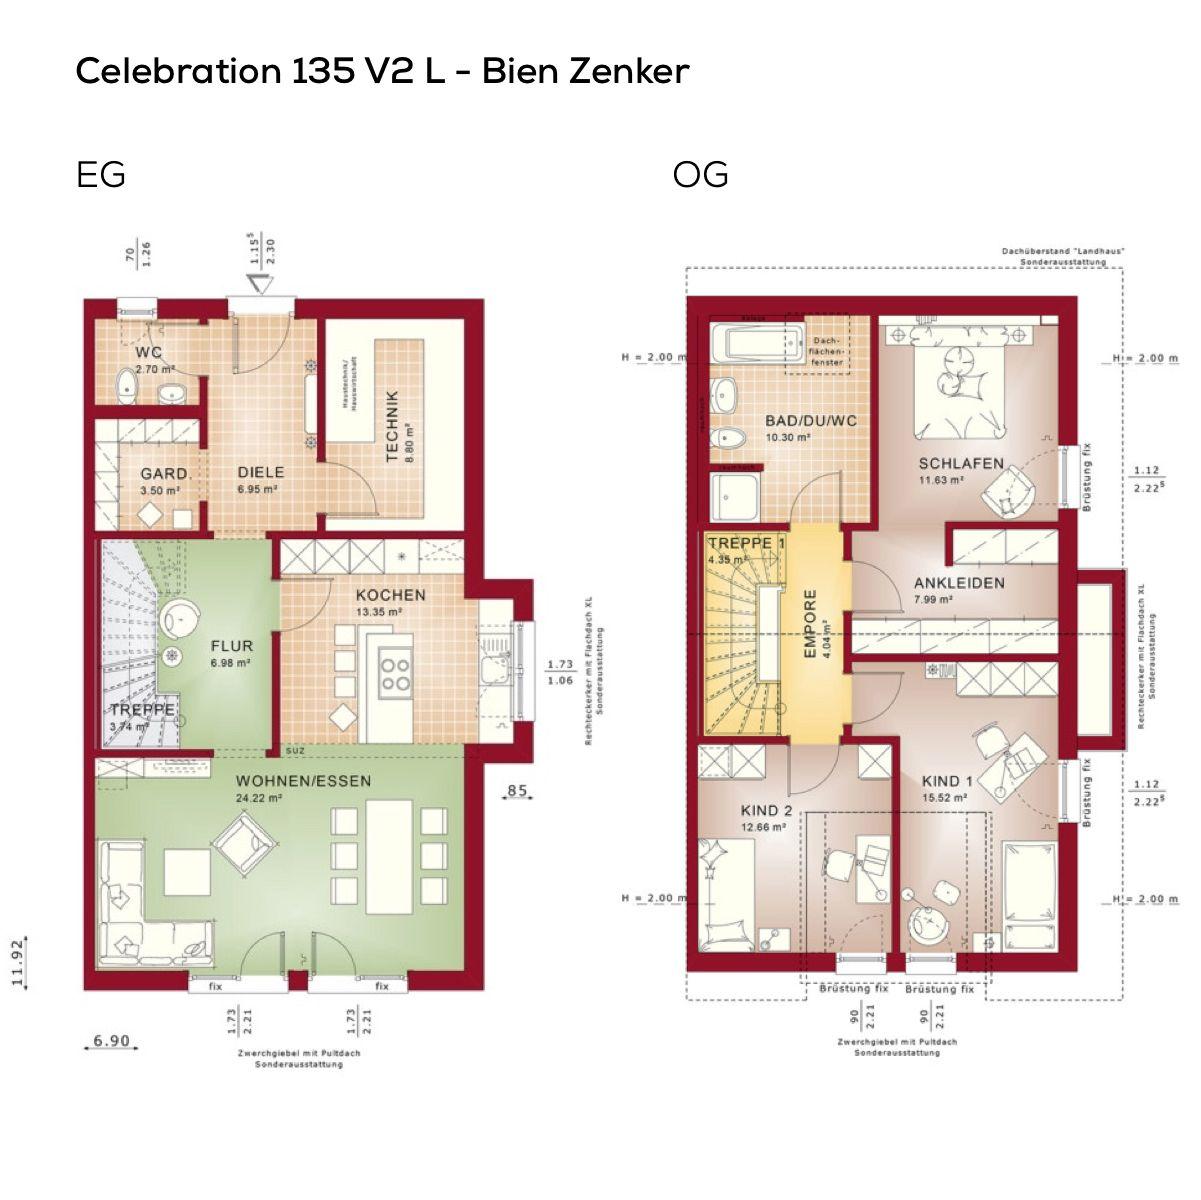 grundrisse doppelhaus mit satteldach architektur 4 zimmer fertighaus grundriss erdgeschoss. Black Bedroom Furniture Sets. Home Design Ideas